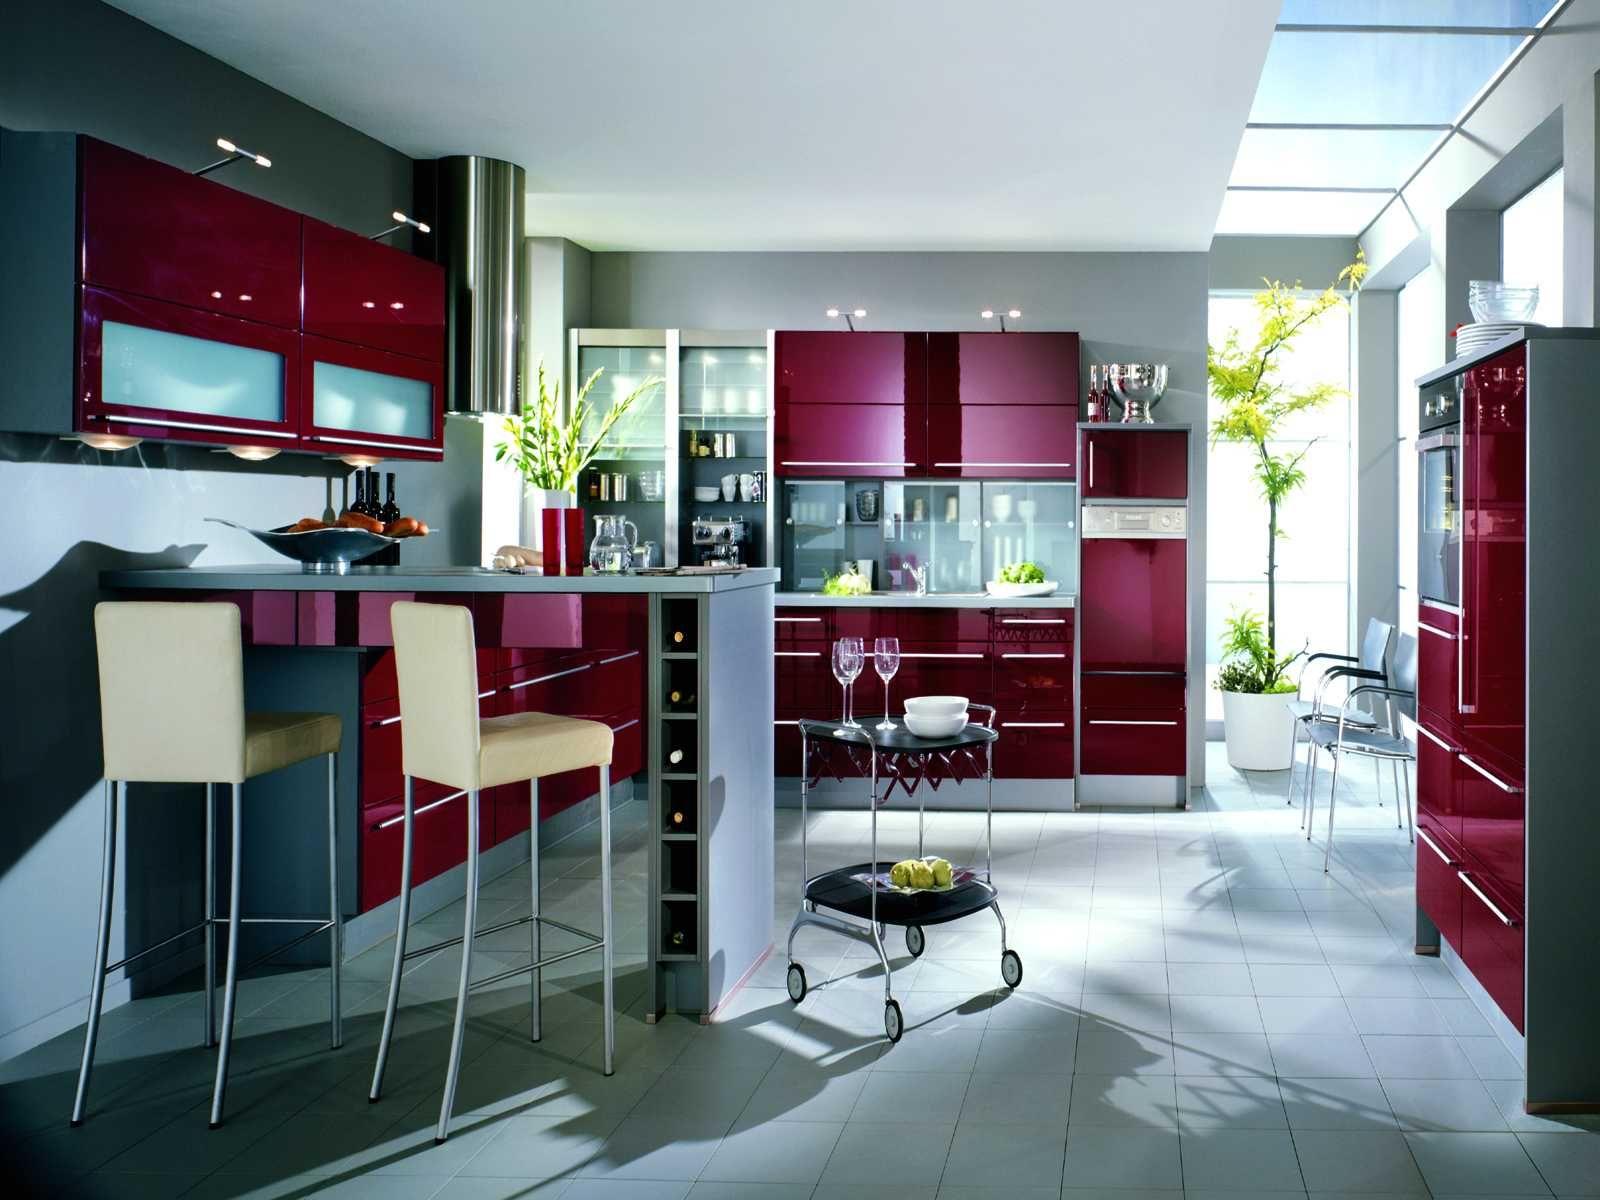 burgundy kitchen furniture for modern home interior home accessories house interior beautiful on kitchen interior accessories id=71491